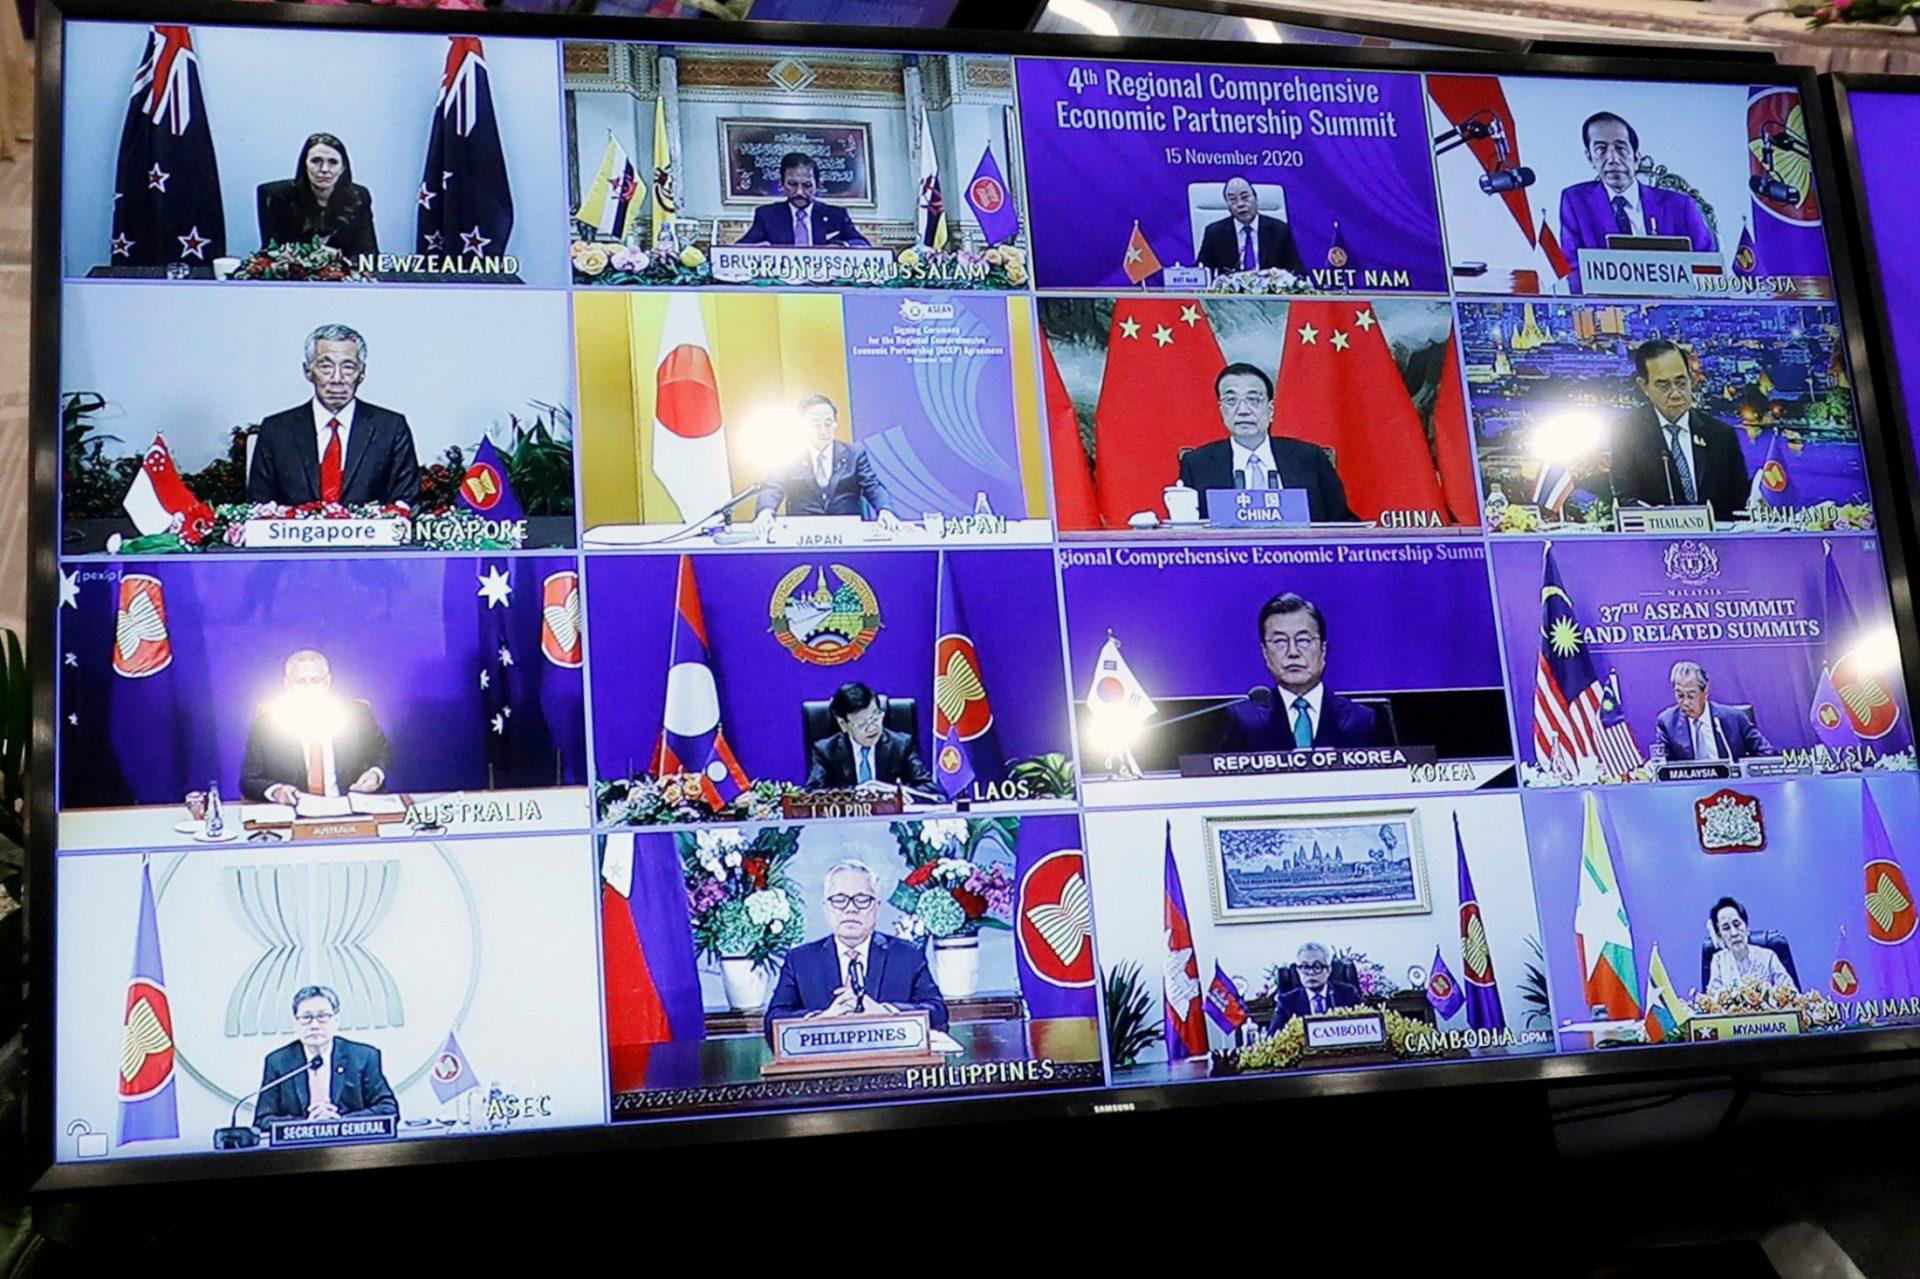 経済連携協定の経済効果